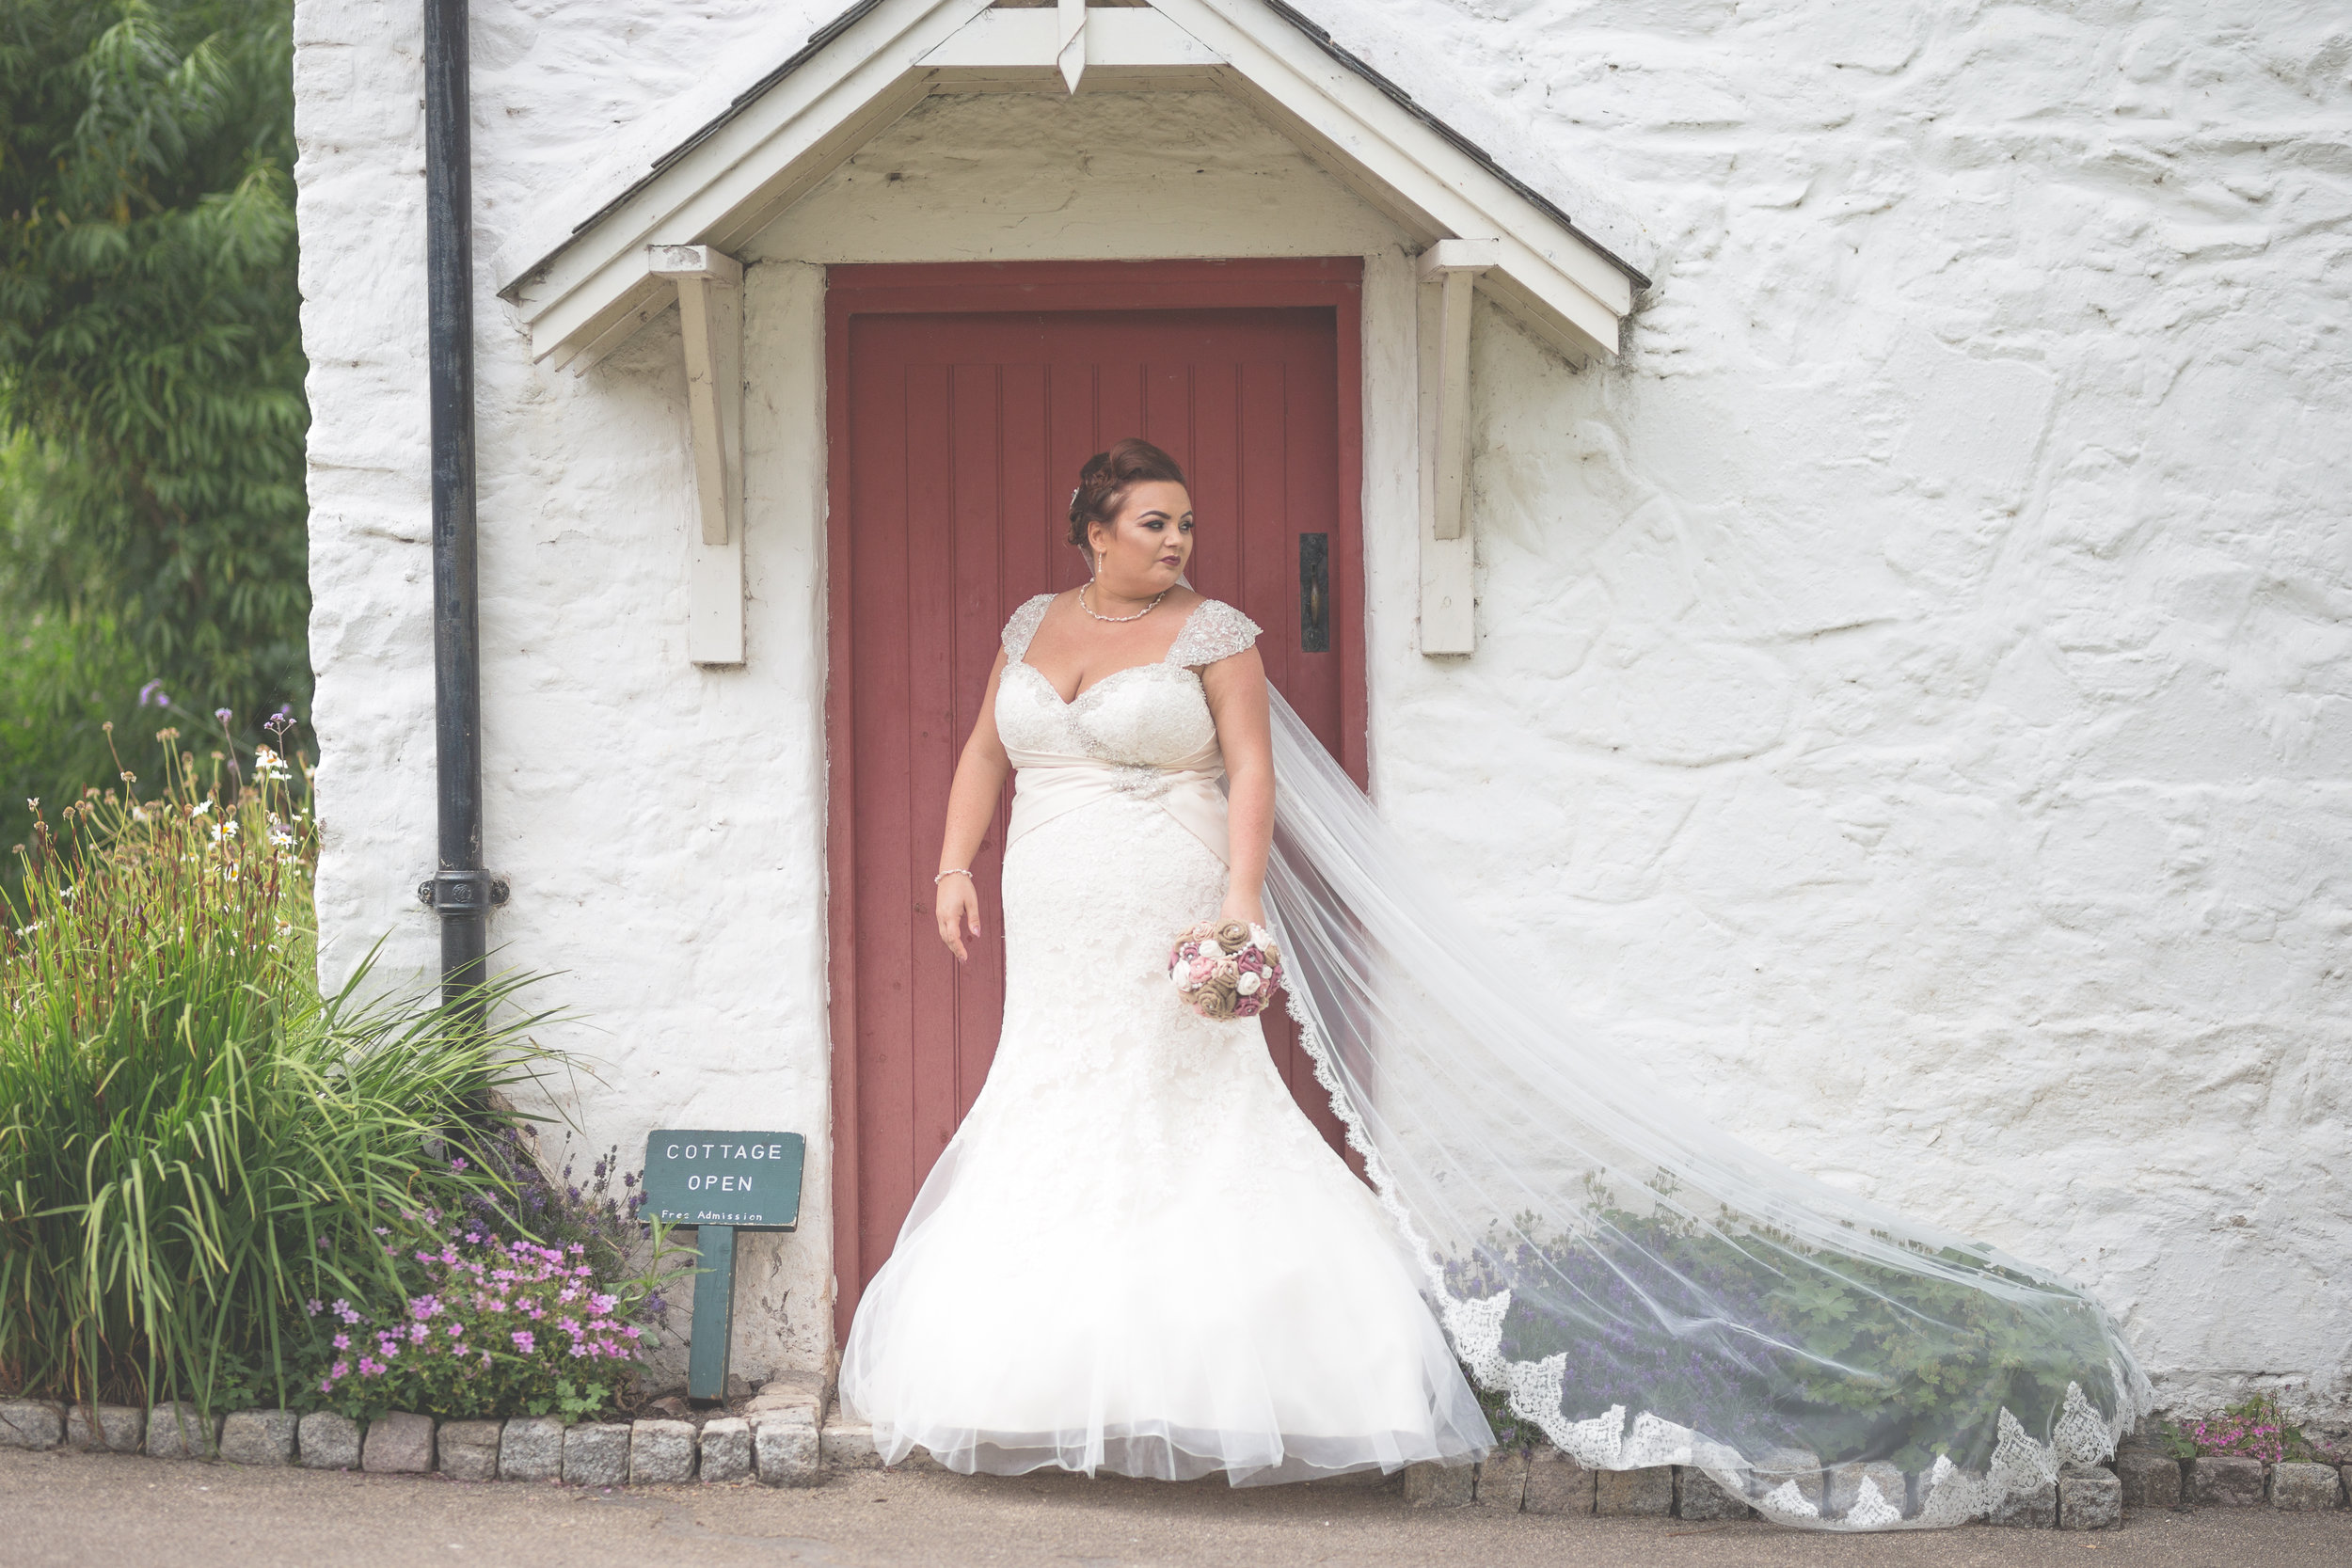 Antoinette & Stephen - Portraits   Brian McEwan Photography   Wedding Photographer Northern Ireland 9.jpg